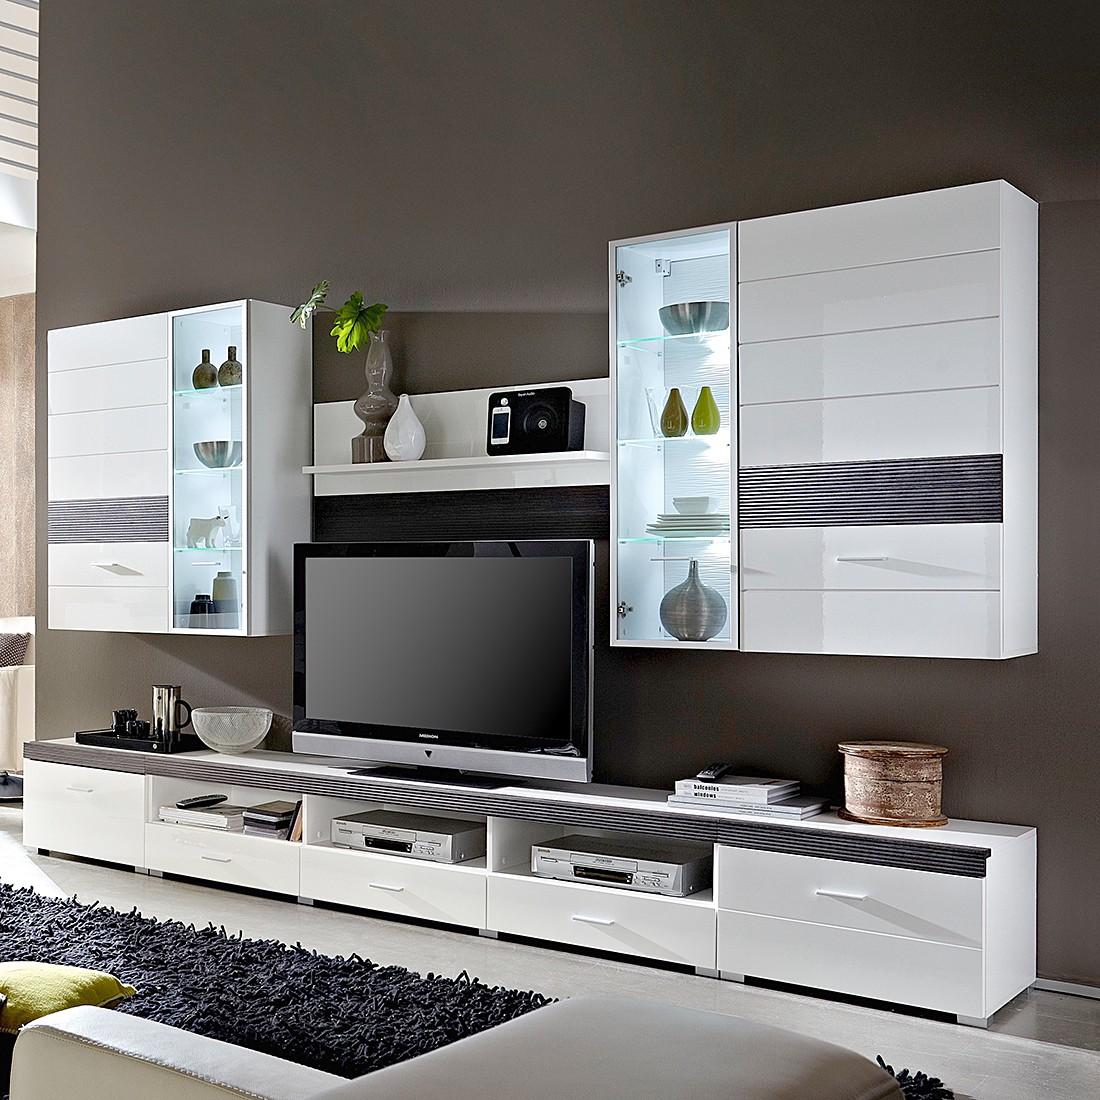 wohnwand evora 6 teilig inkl beleuchtung hochglanz. Black Bedroom Furniture Sets. Home Design Ideas